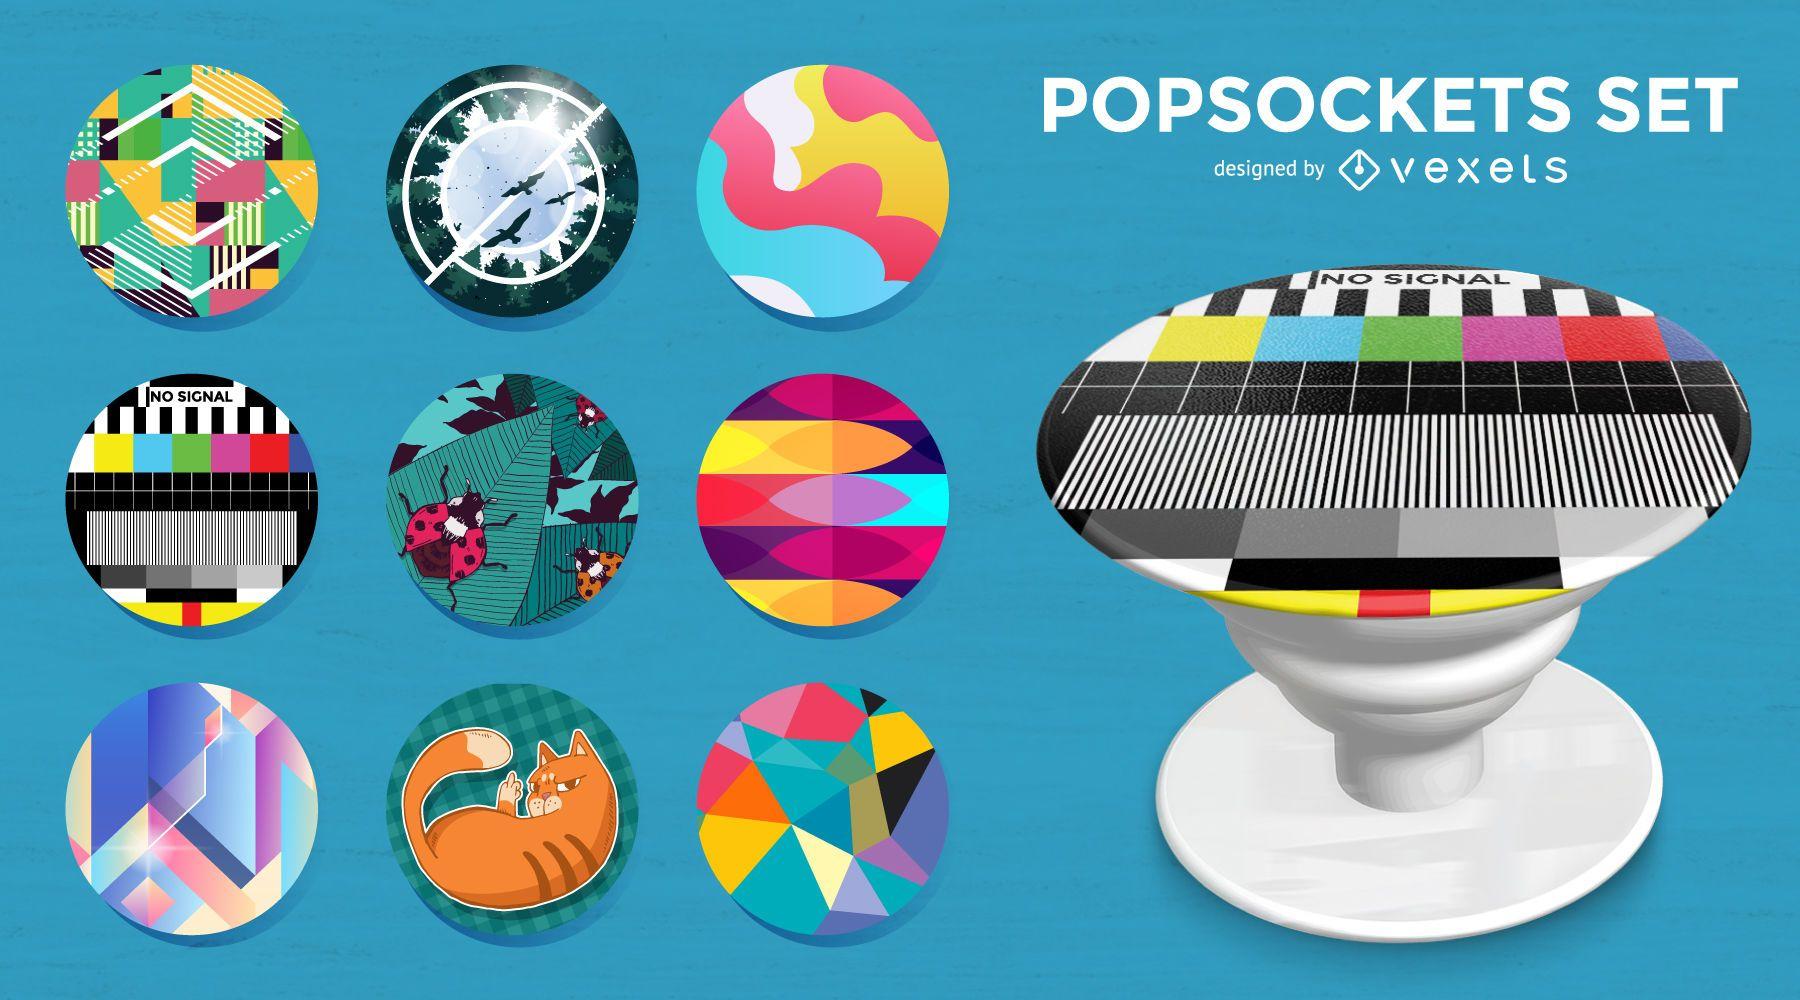 Illustrated popsockets set